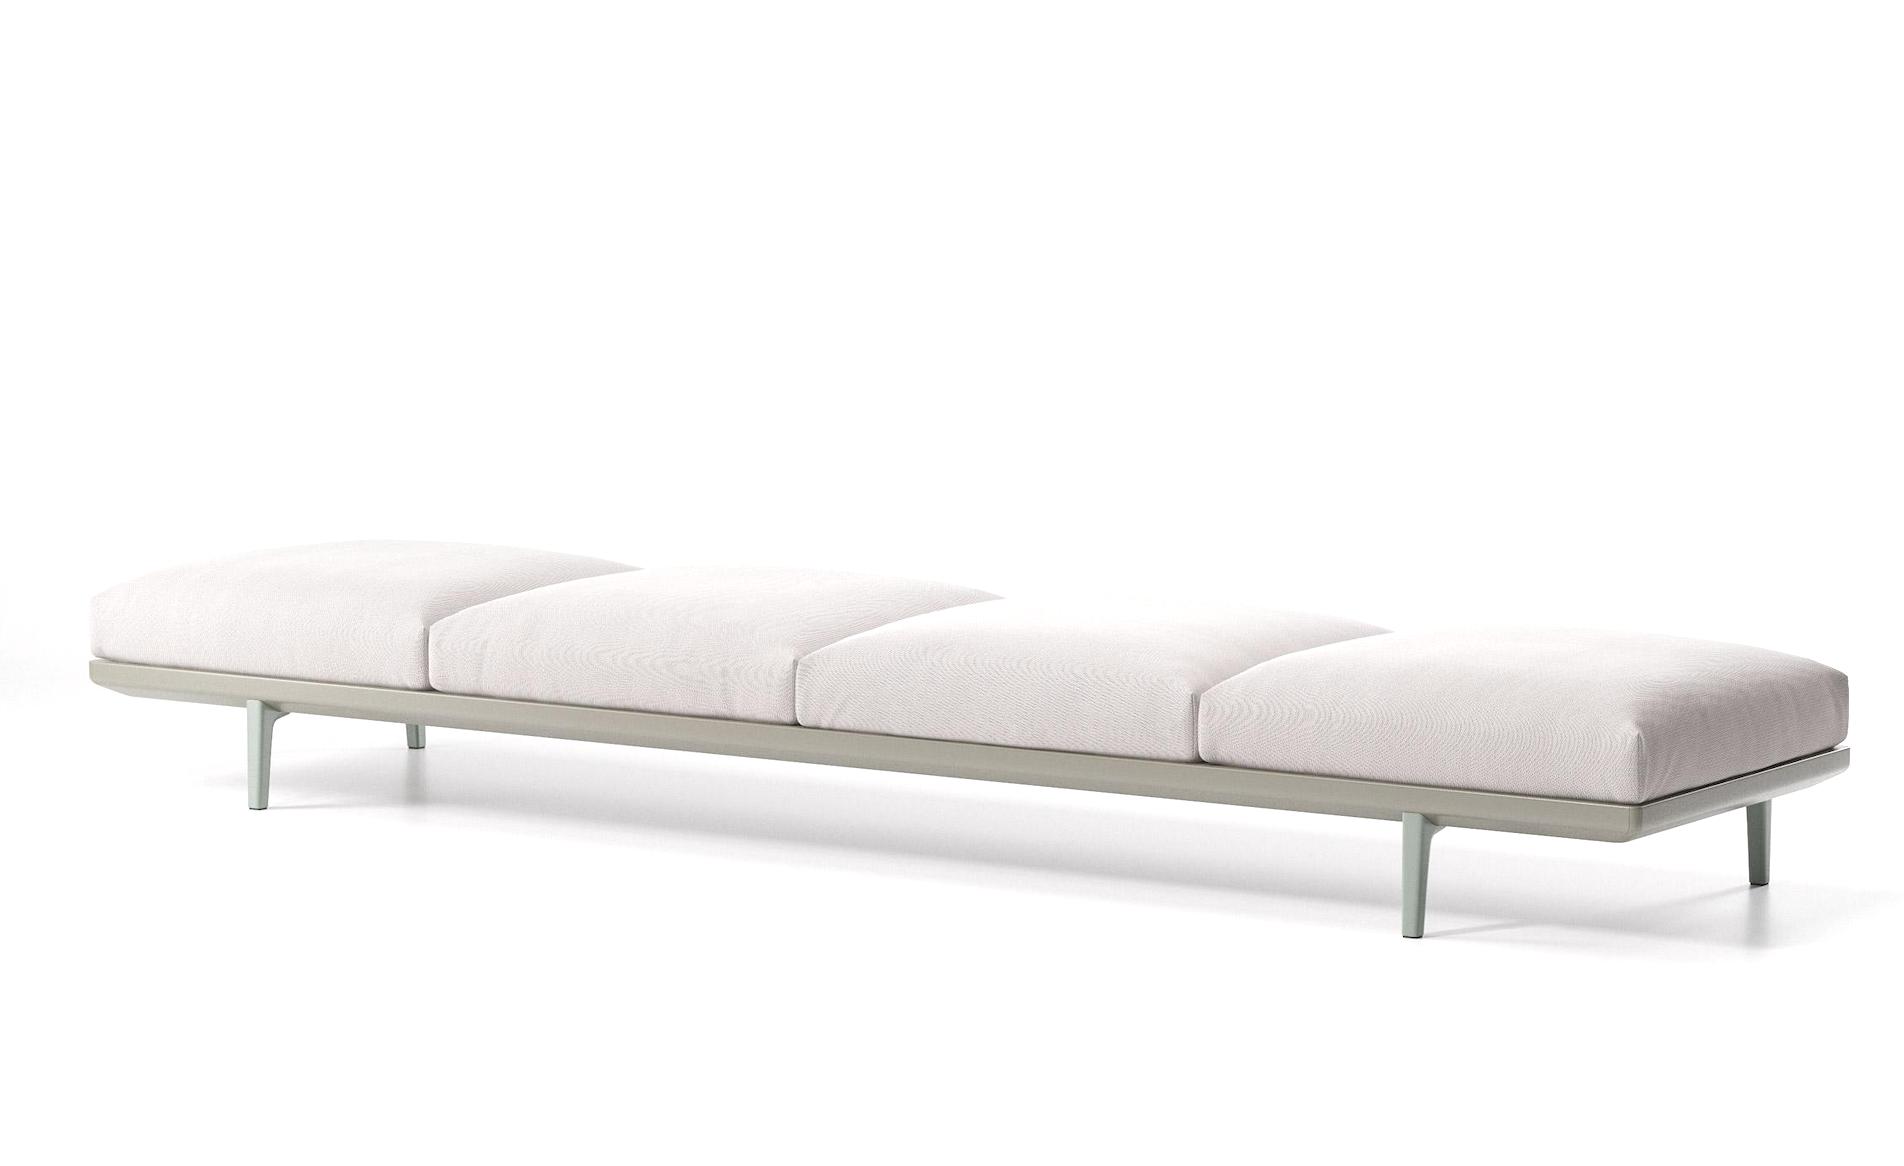 Product Image Boma 4 Seat bench